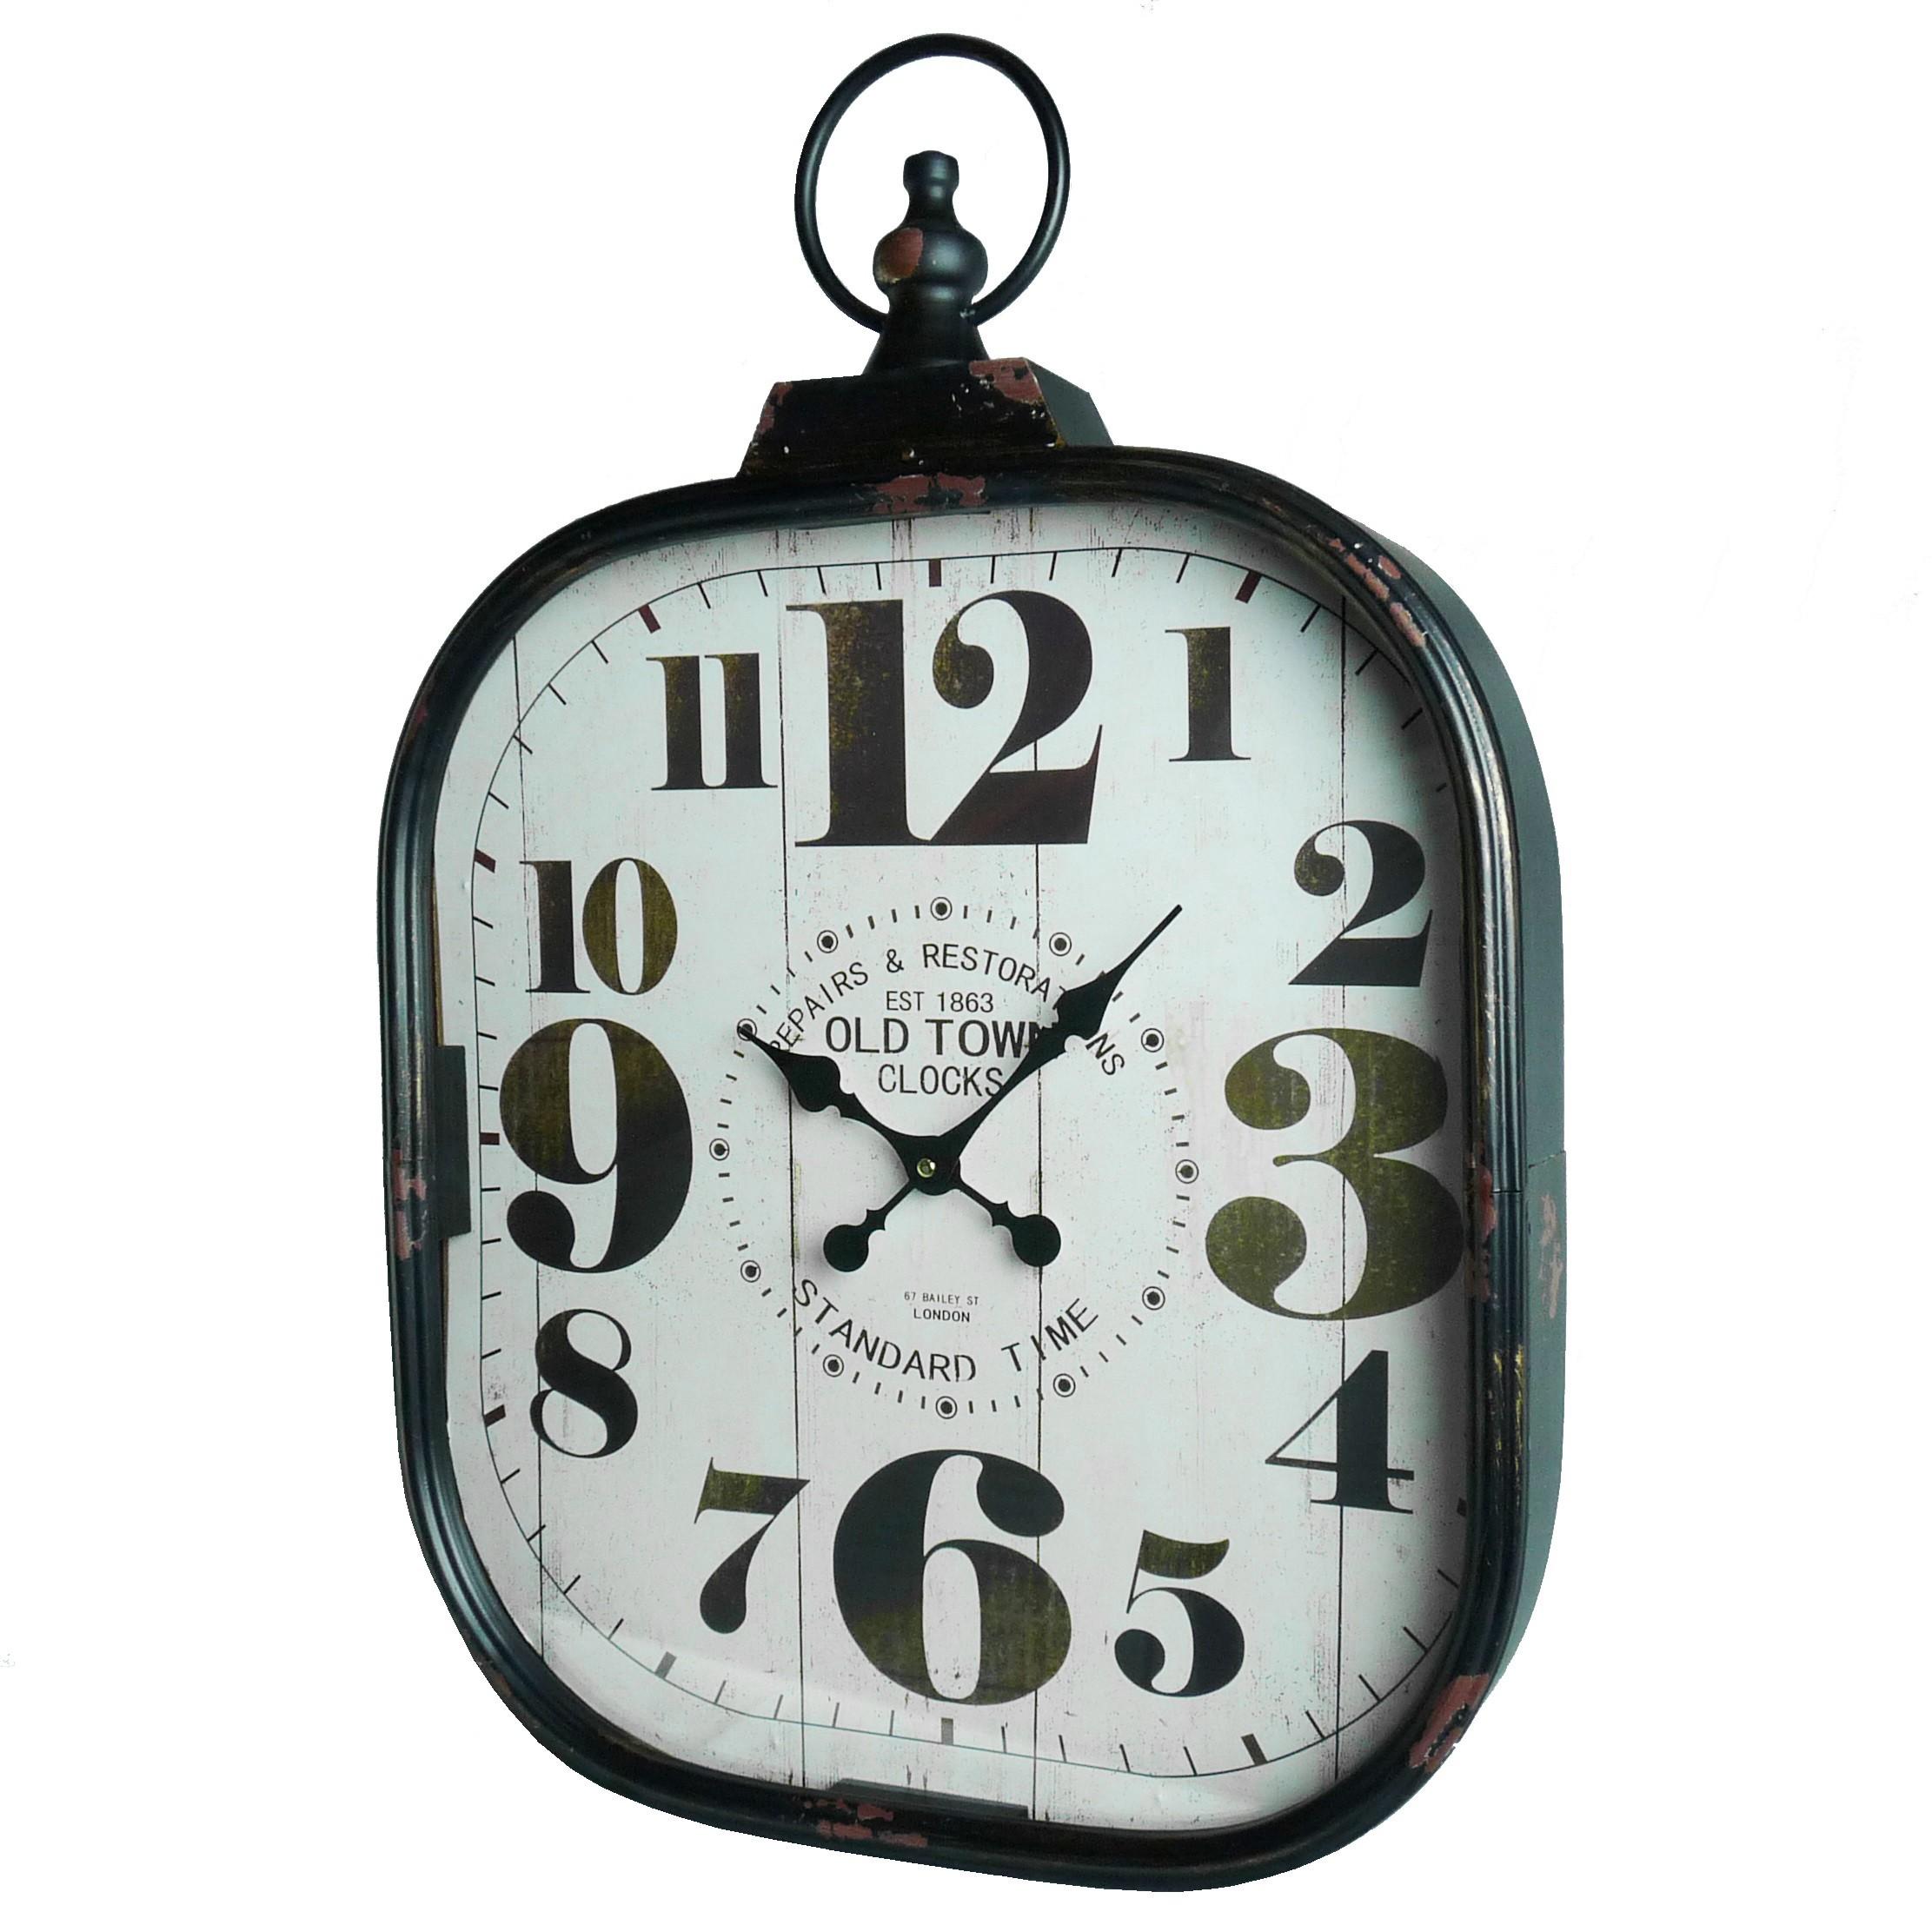 Horloge murale style industriel best mobili rebecca for Horloge murale style industriel